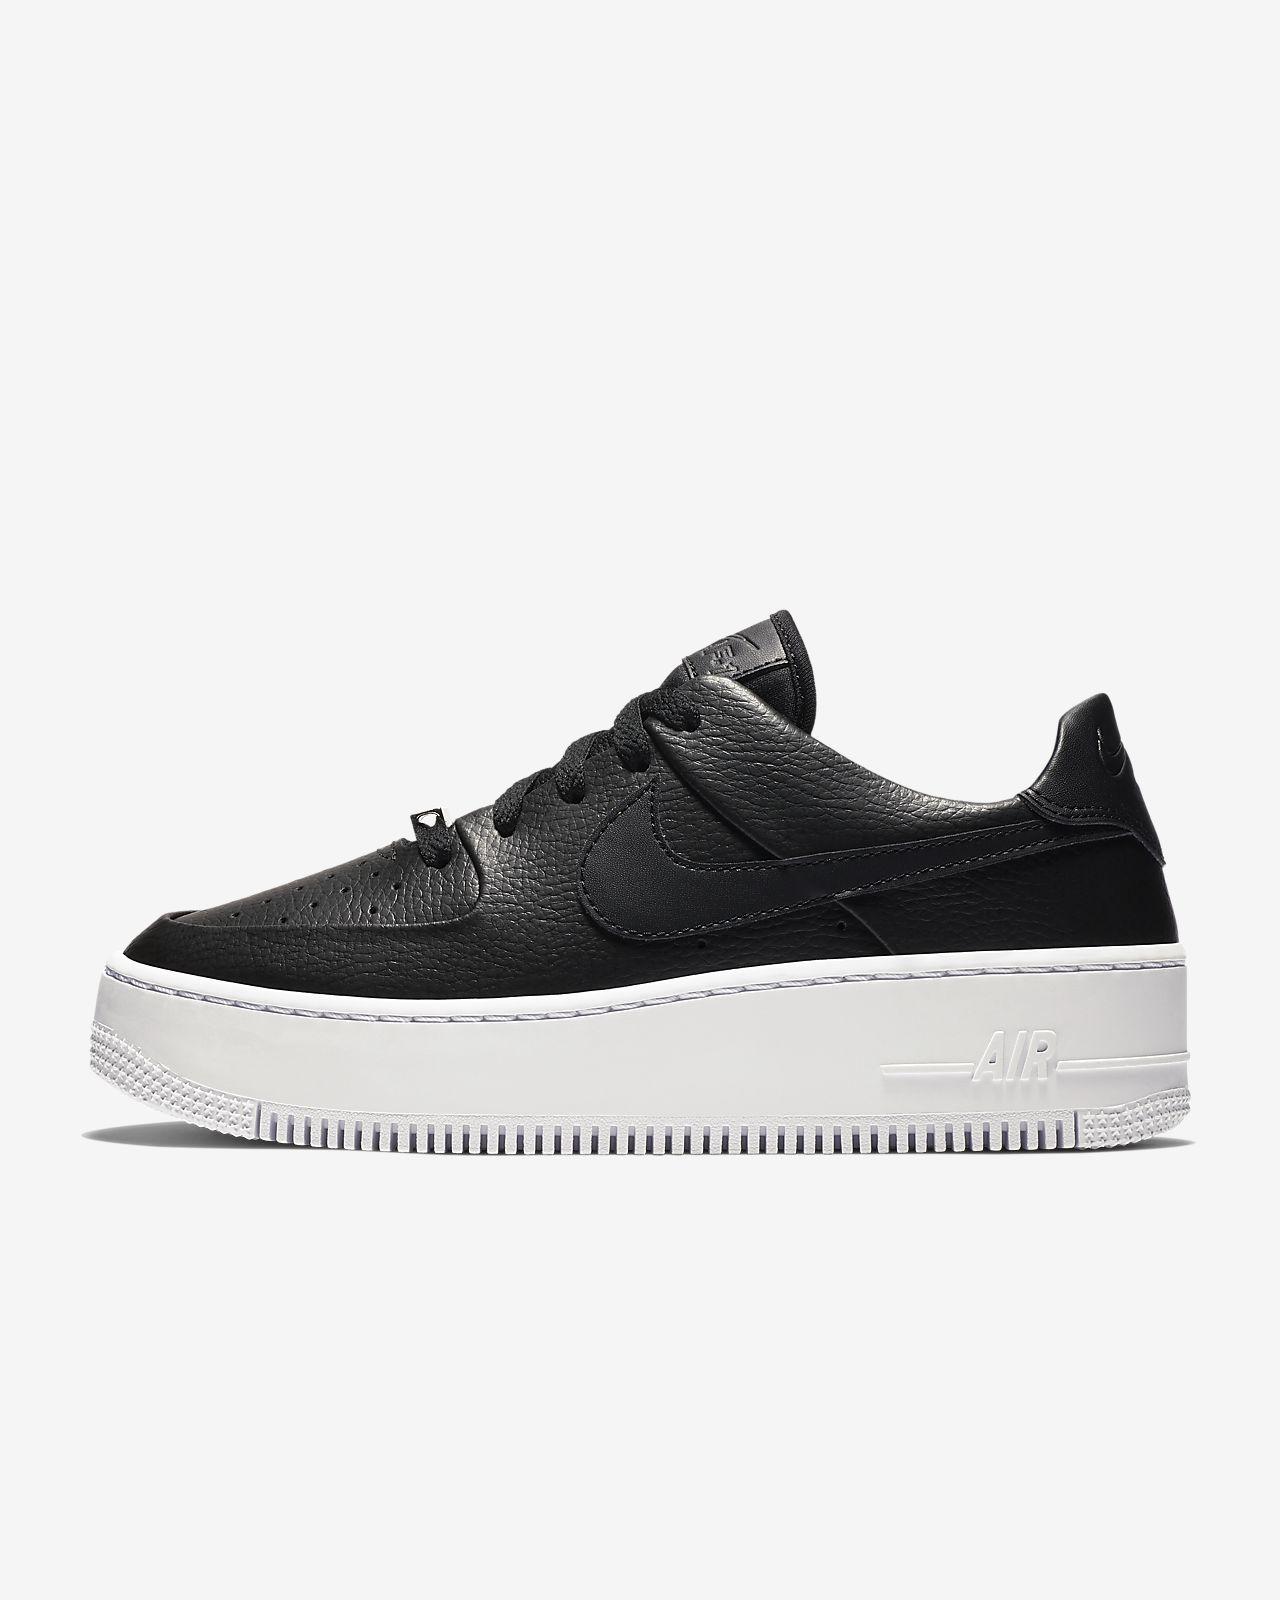 dfdfae0b873 Nike Women s Shoe Force 1 Sage Low in 2019